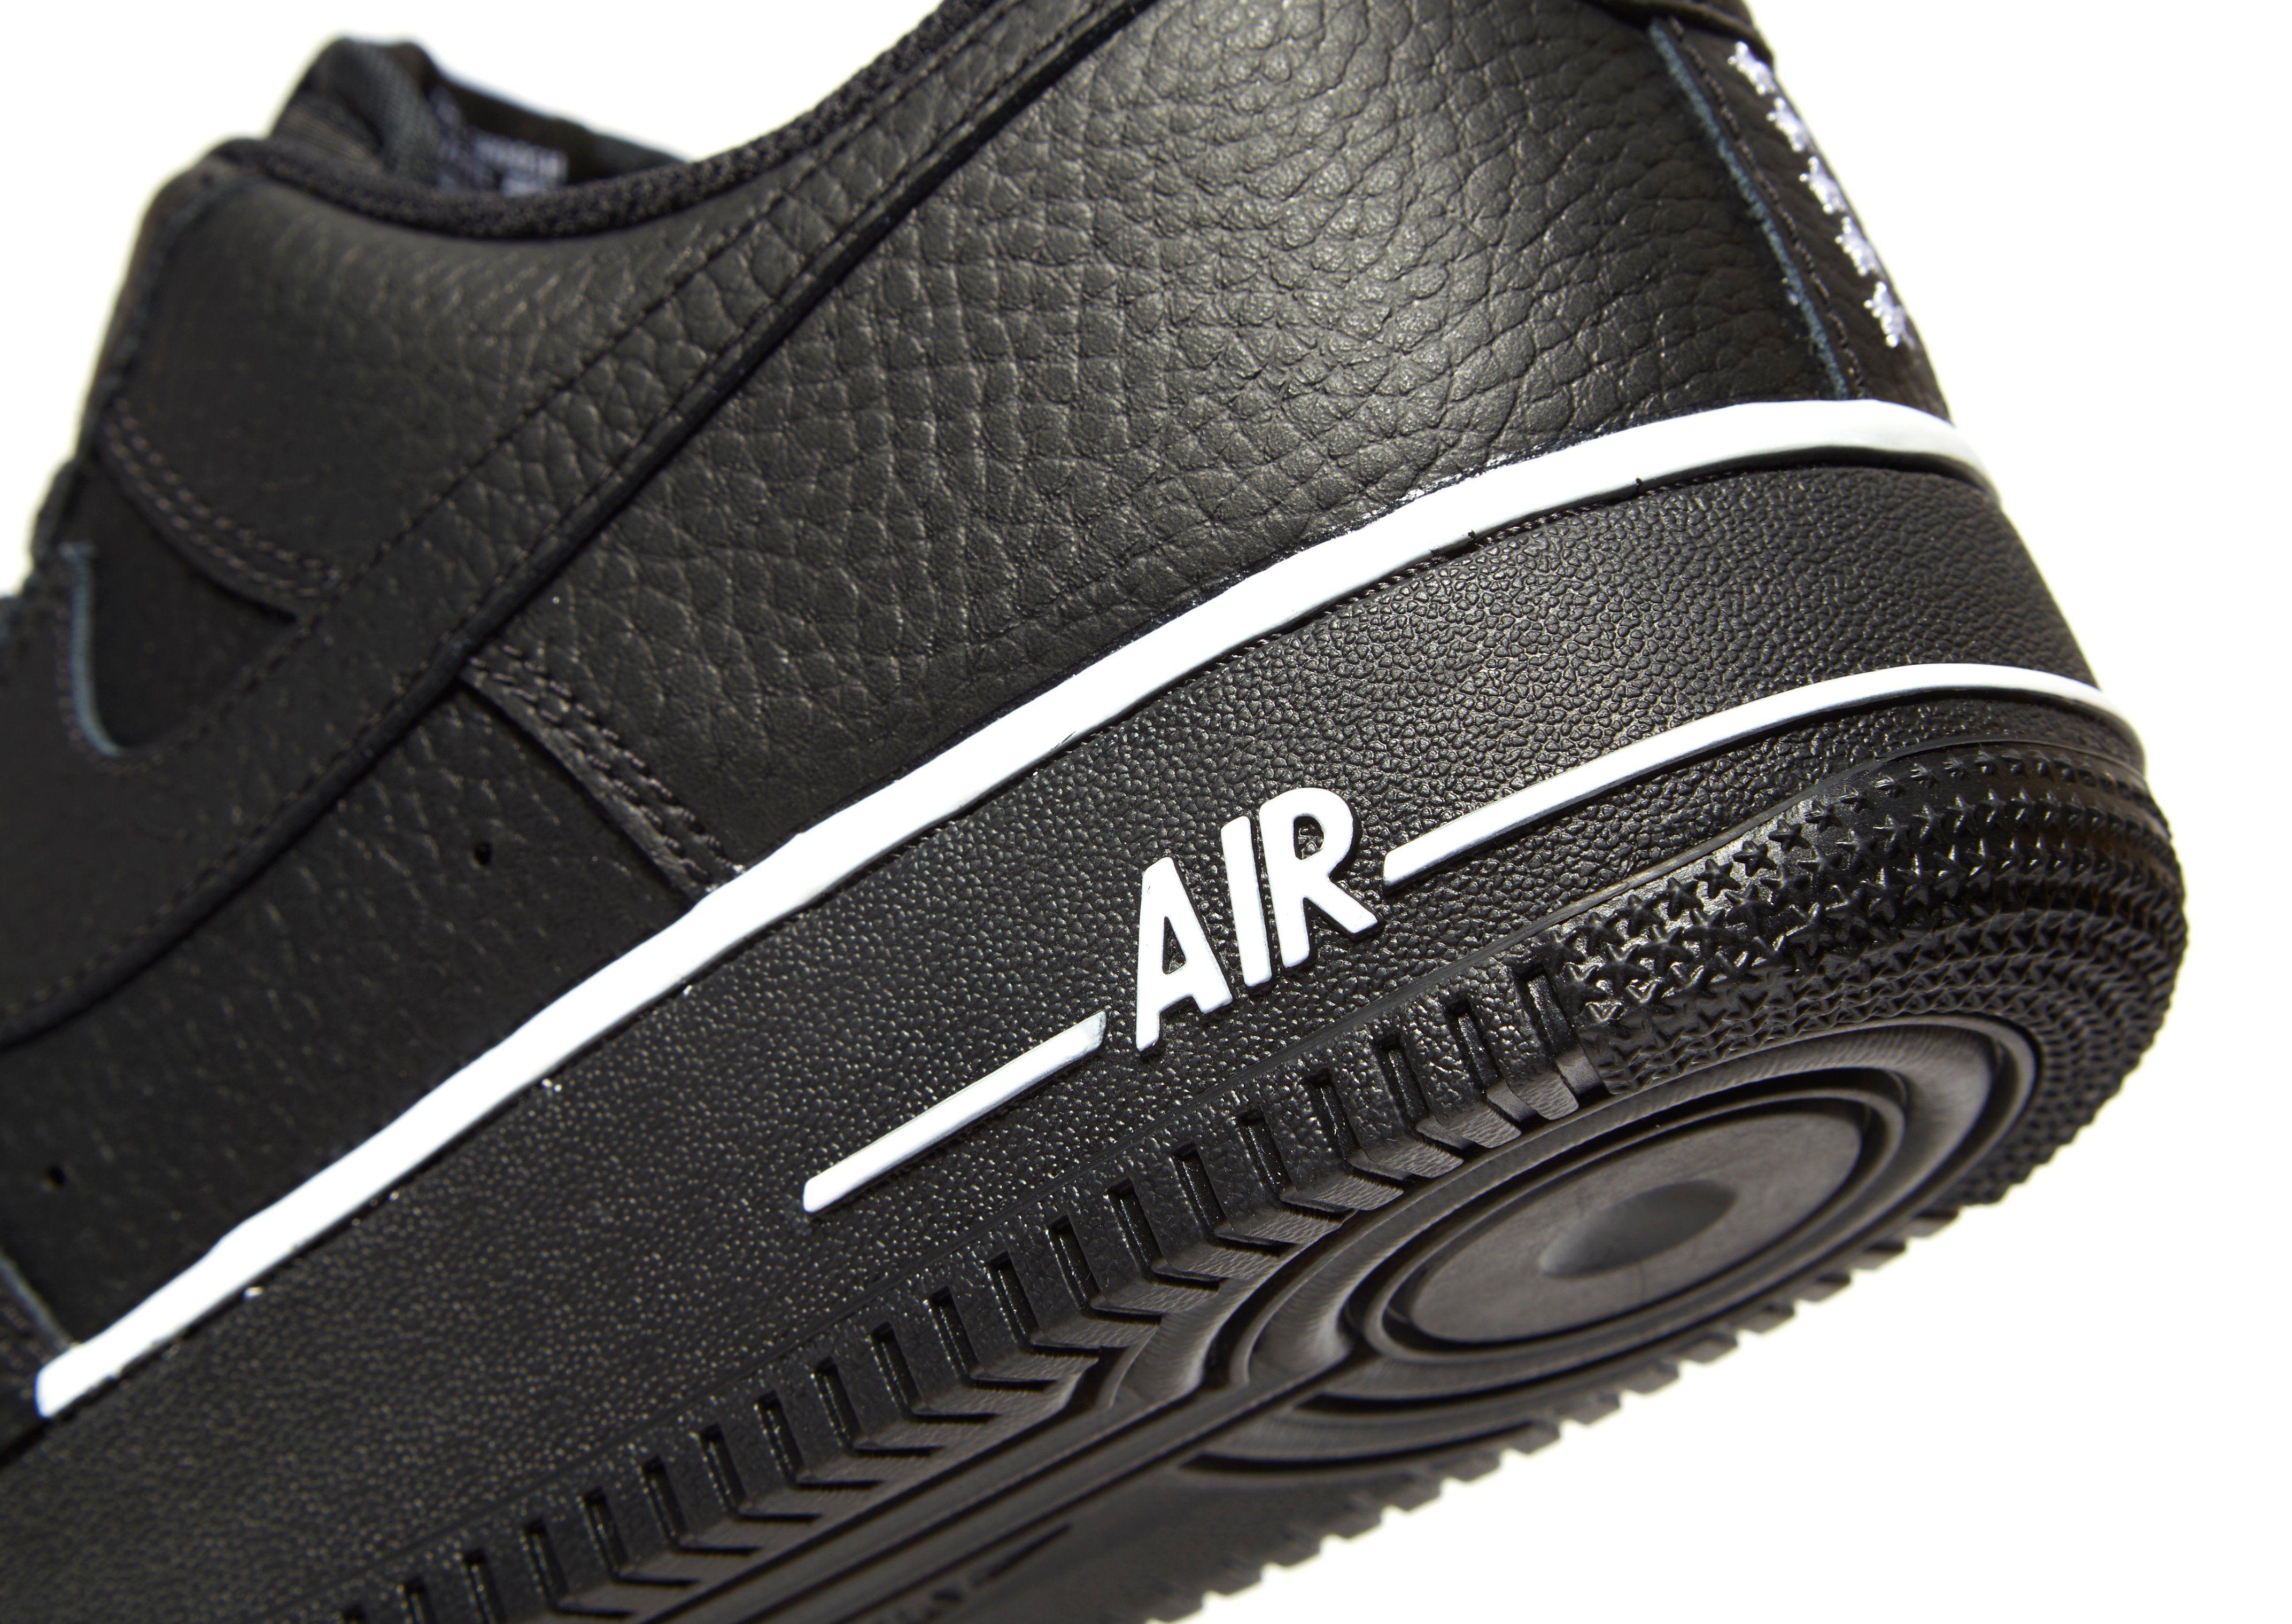 Nike Air Force 1 Low Schwarz-Weiß